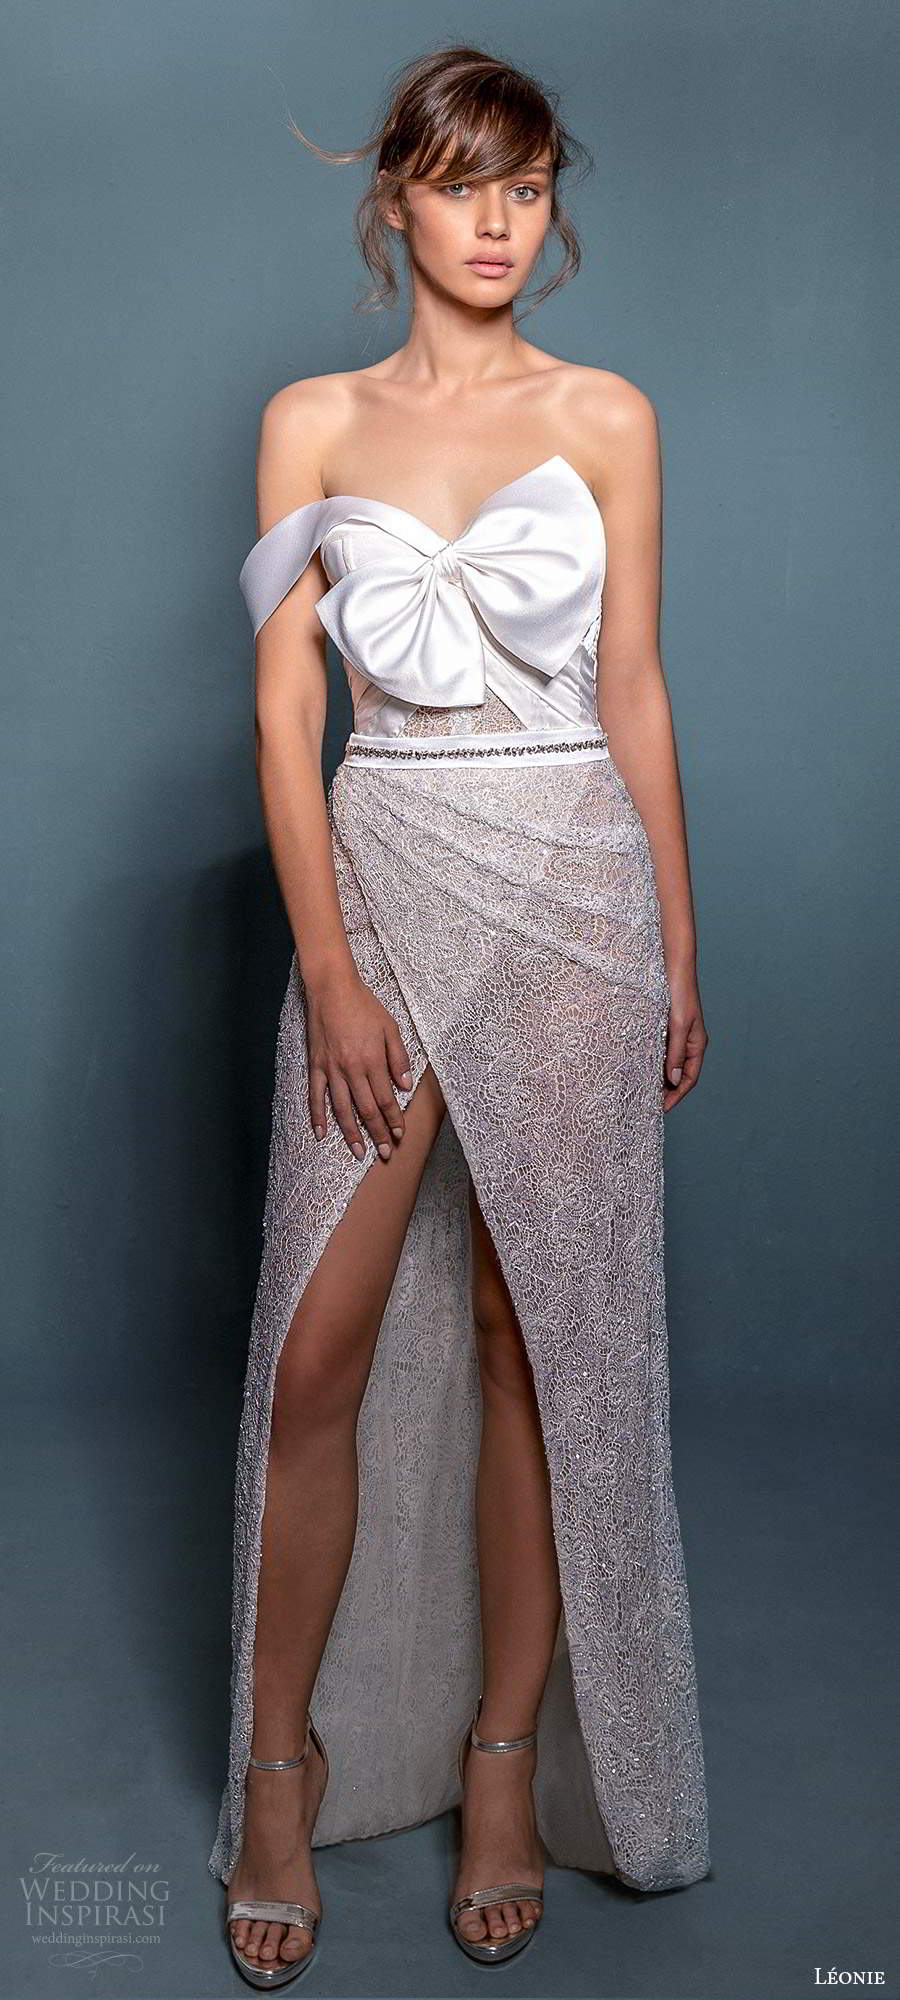 leonie bridal 2020 bridal one shoulder stap asymmetrical neckline fully embellished sheath wedding dress slit skirt (11) mv